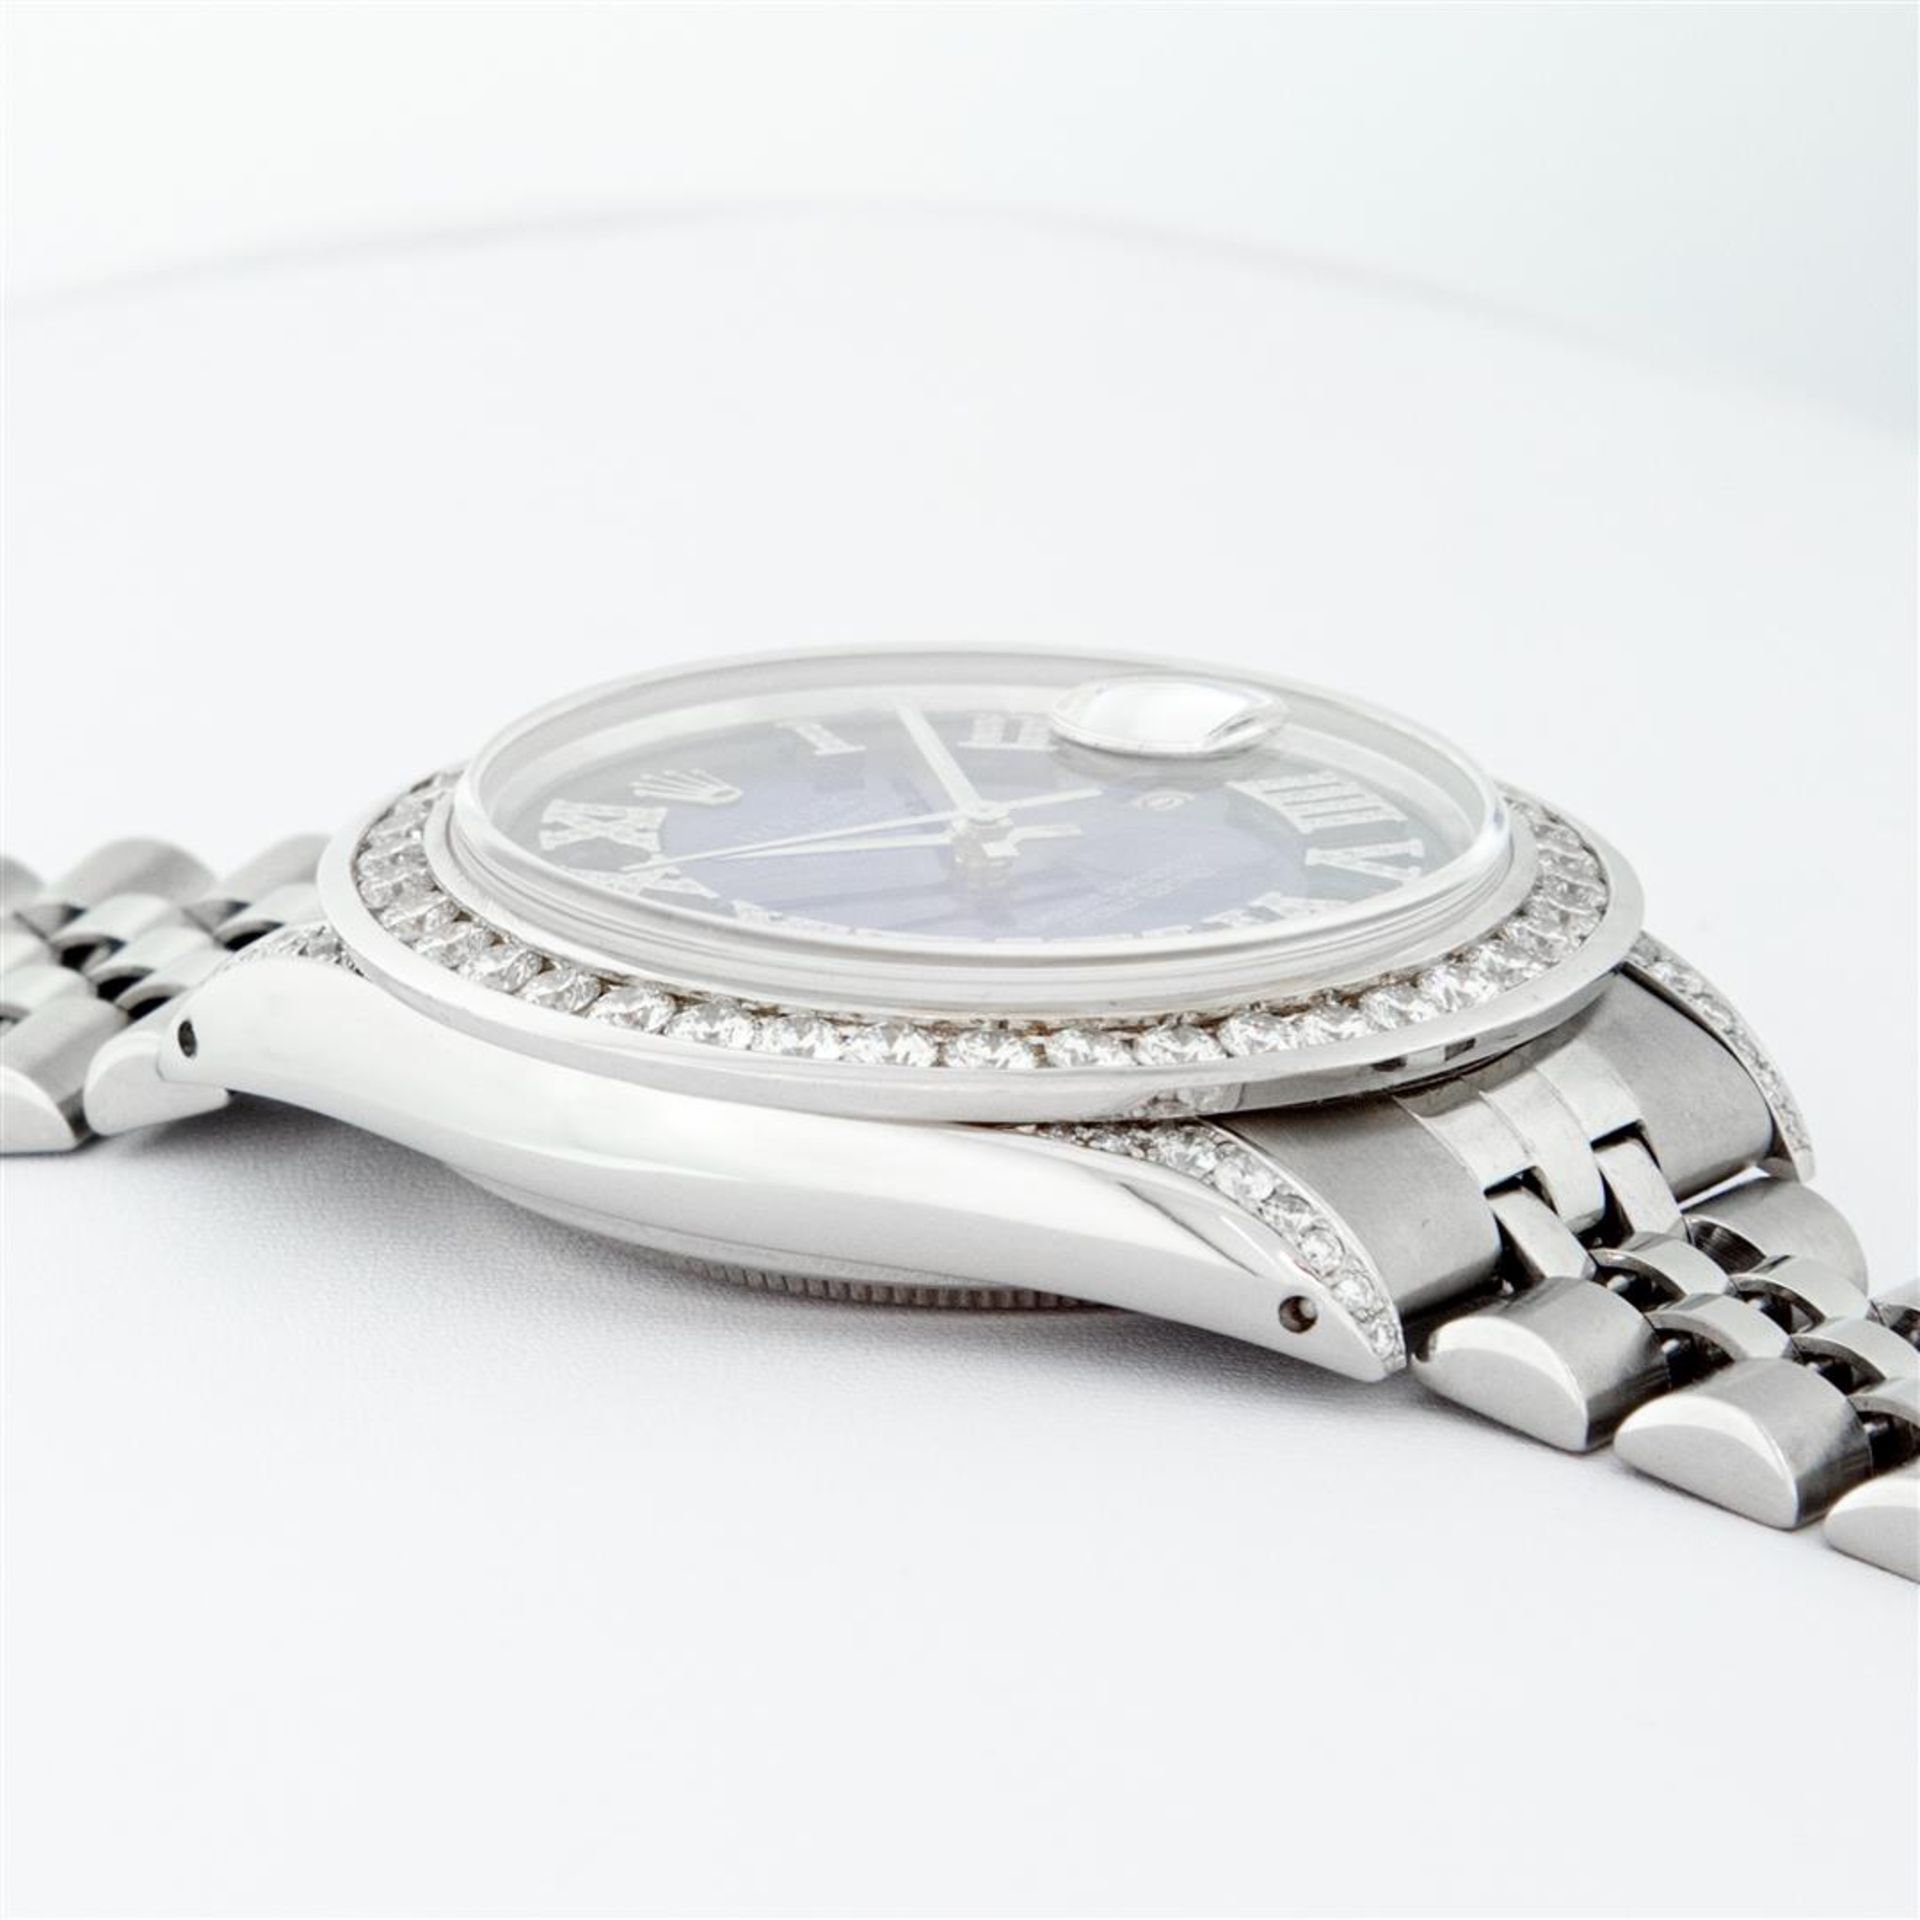 Rolex Mens Stainless Steel Blue Vignette Roman 3ctw Diamond Datejust Wristwatch - Image 4 of 9